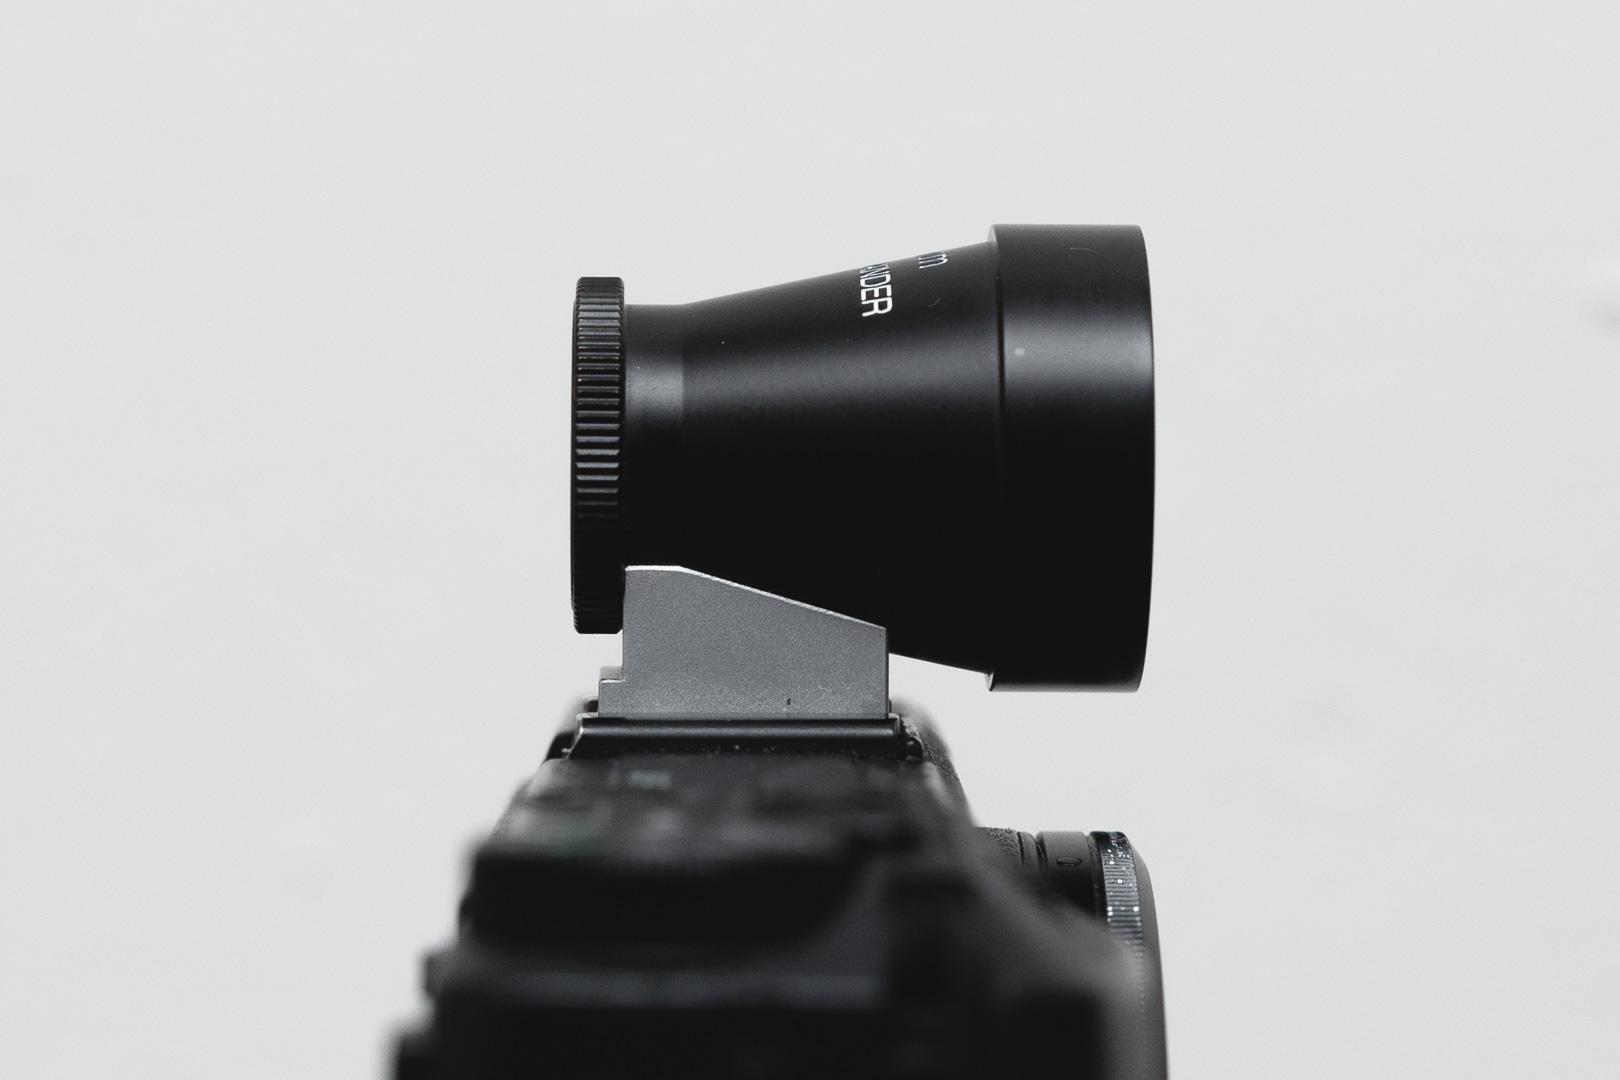 Voigtlander-35mm-Brightline-Finder-Ant Tran-20170402-3012.jpg